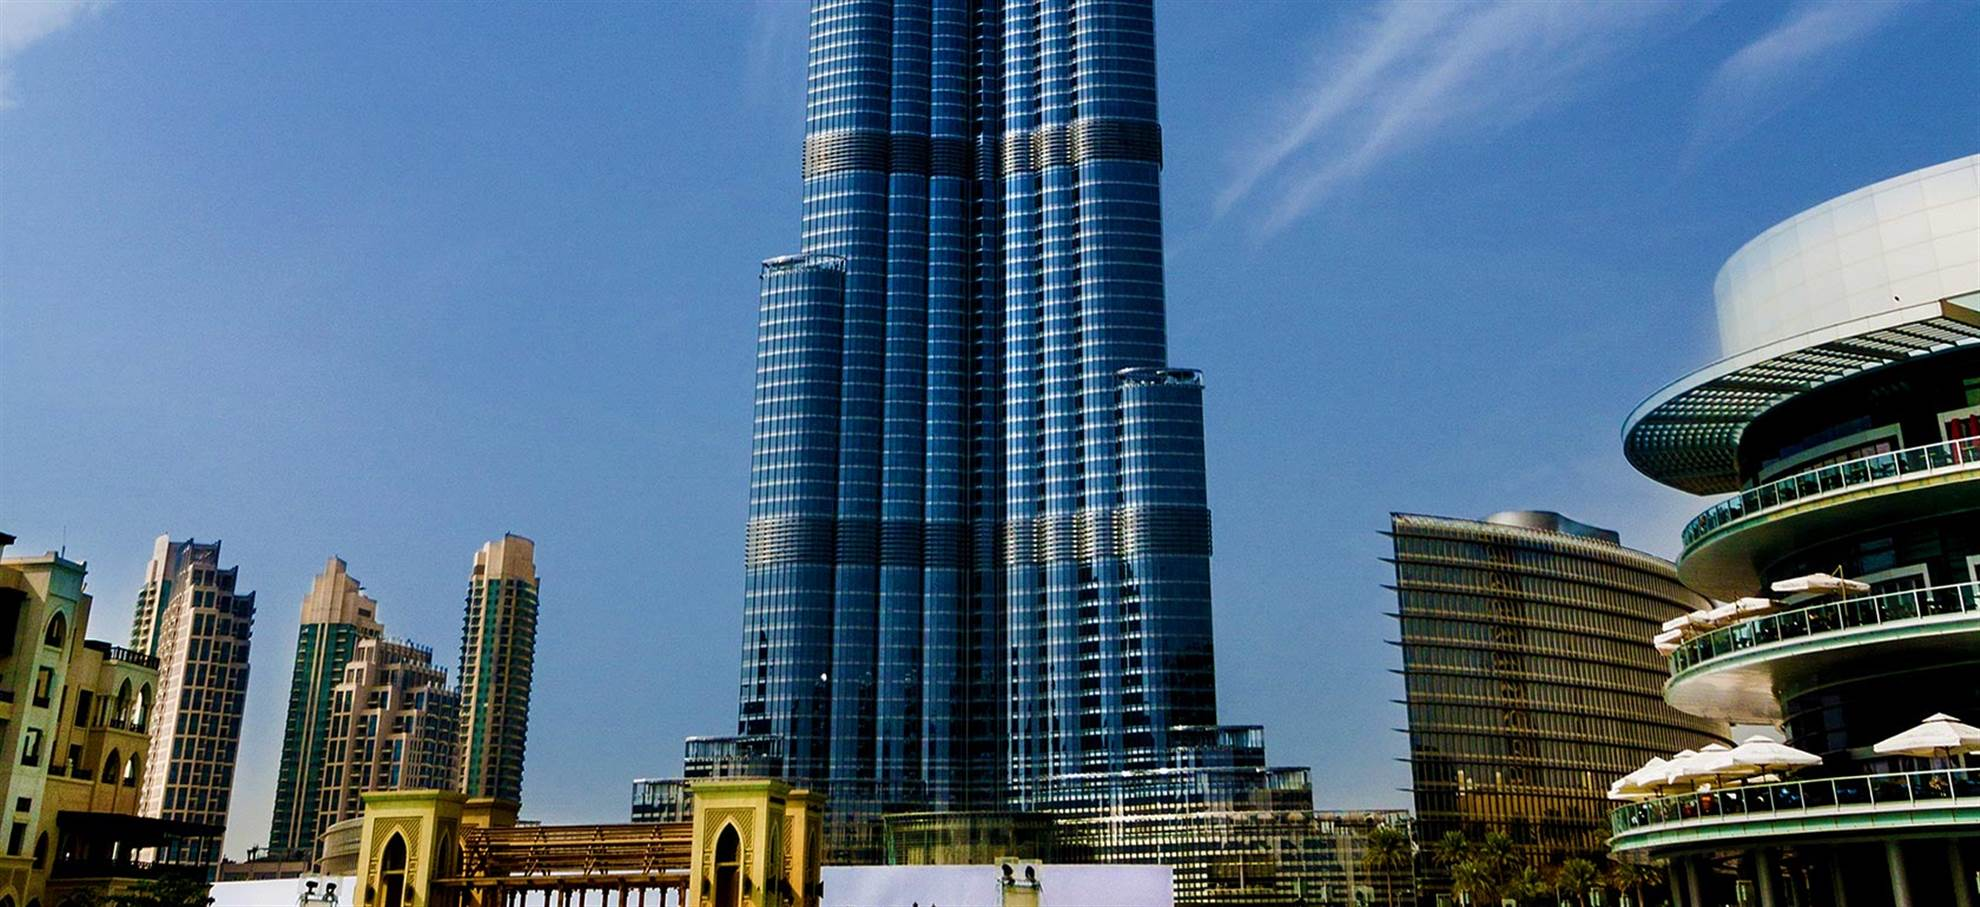 Begin your Dubai sightseeing with Burj